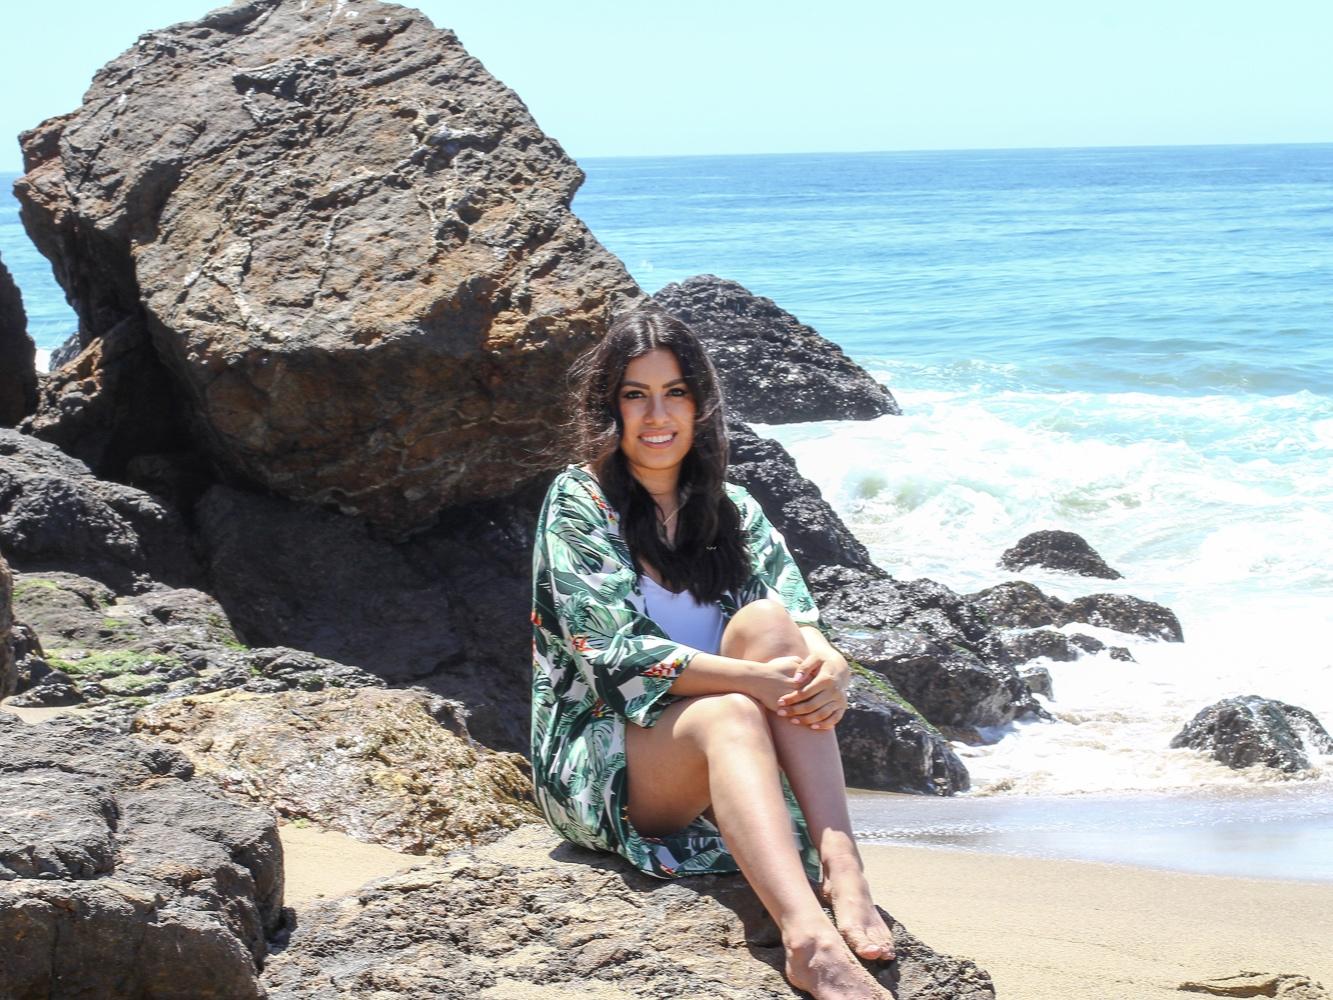 inspired coach magazine - My first Year as a Coach: Jessica Estrada